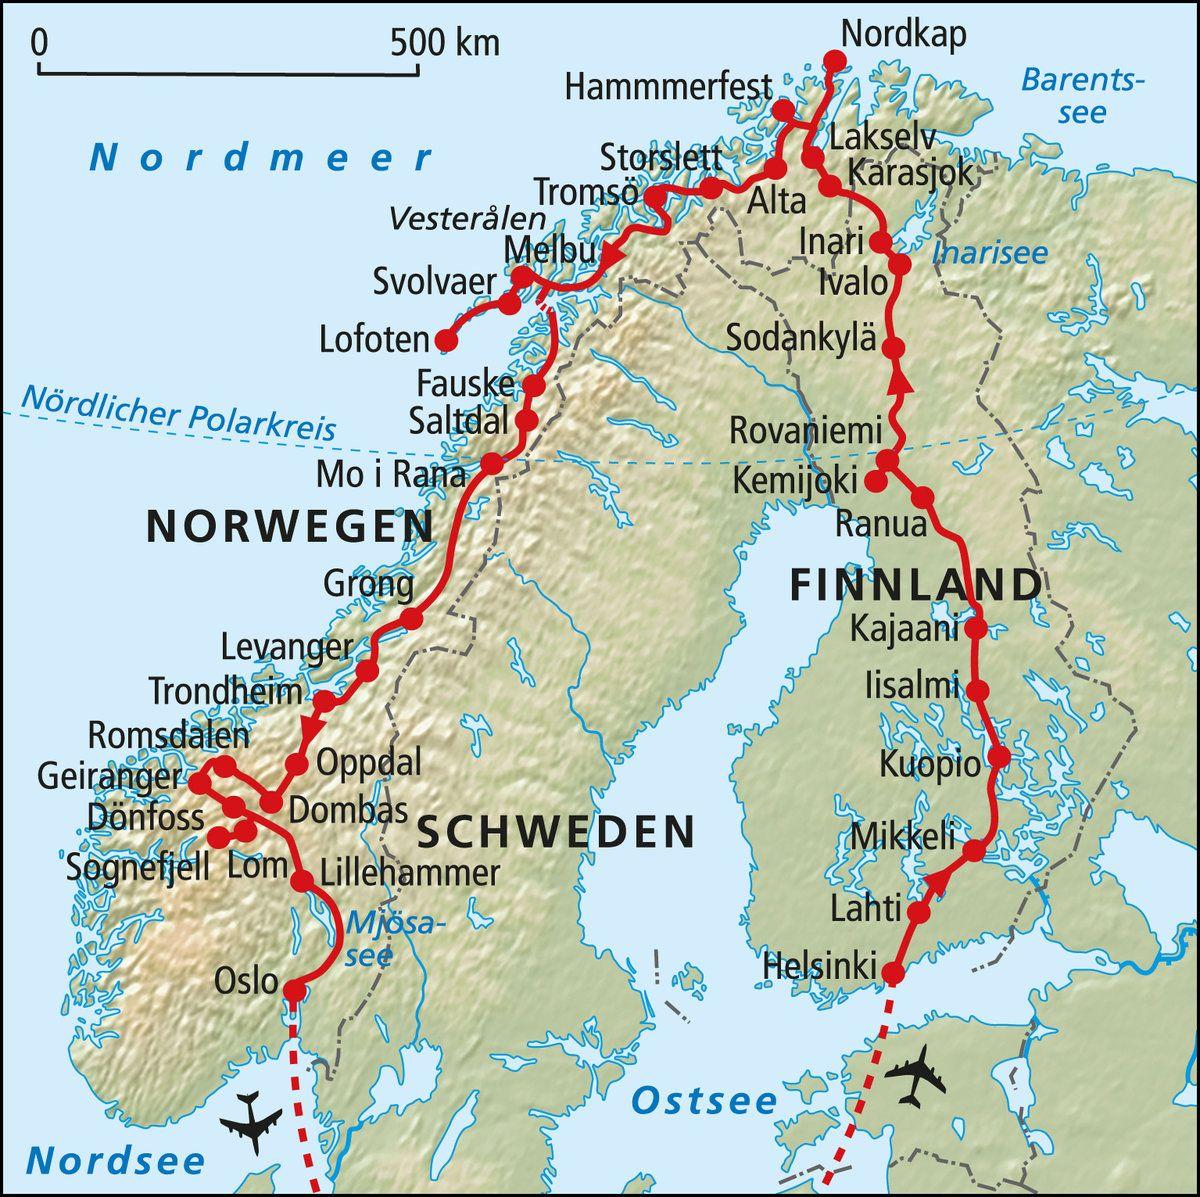 Nordkap Reise Durch Skandinavien Rotel Tours Das Rollende Hotel In 2020 Nordkap Skandinavien Skandinavien Rundreise